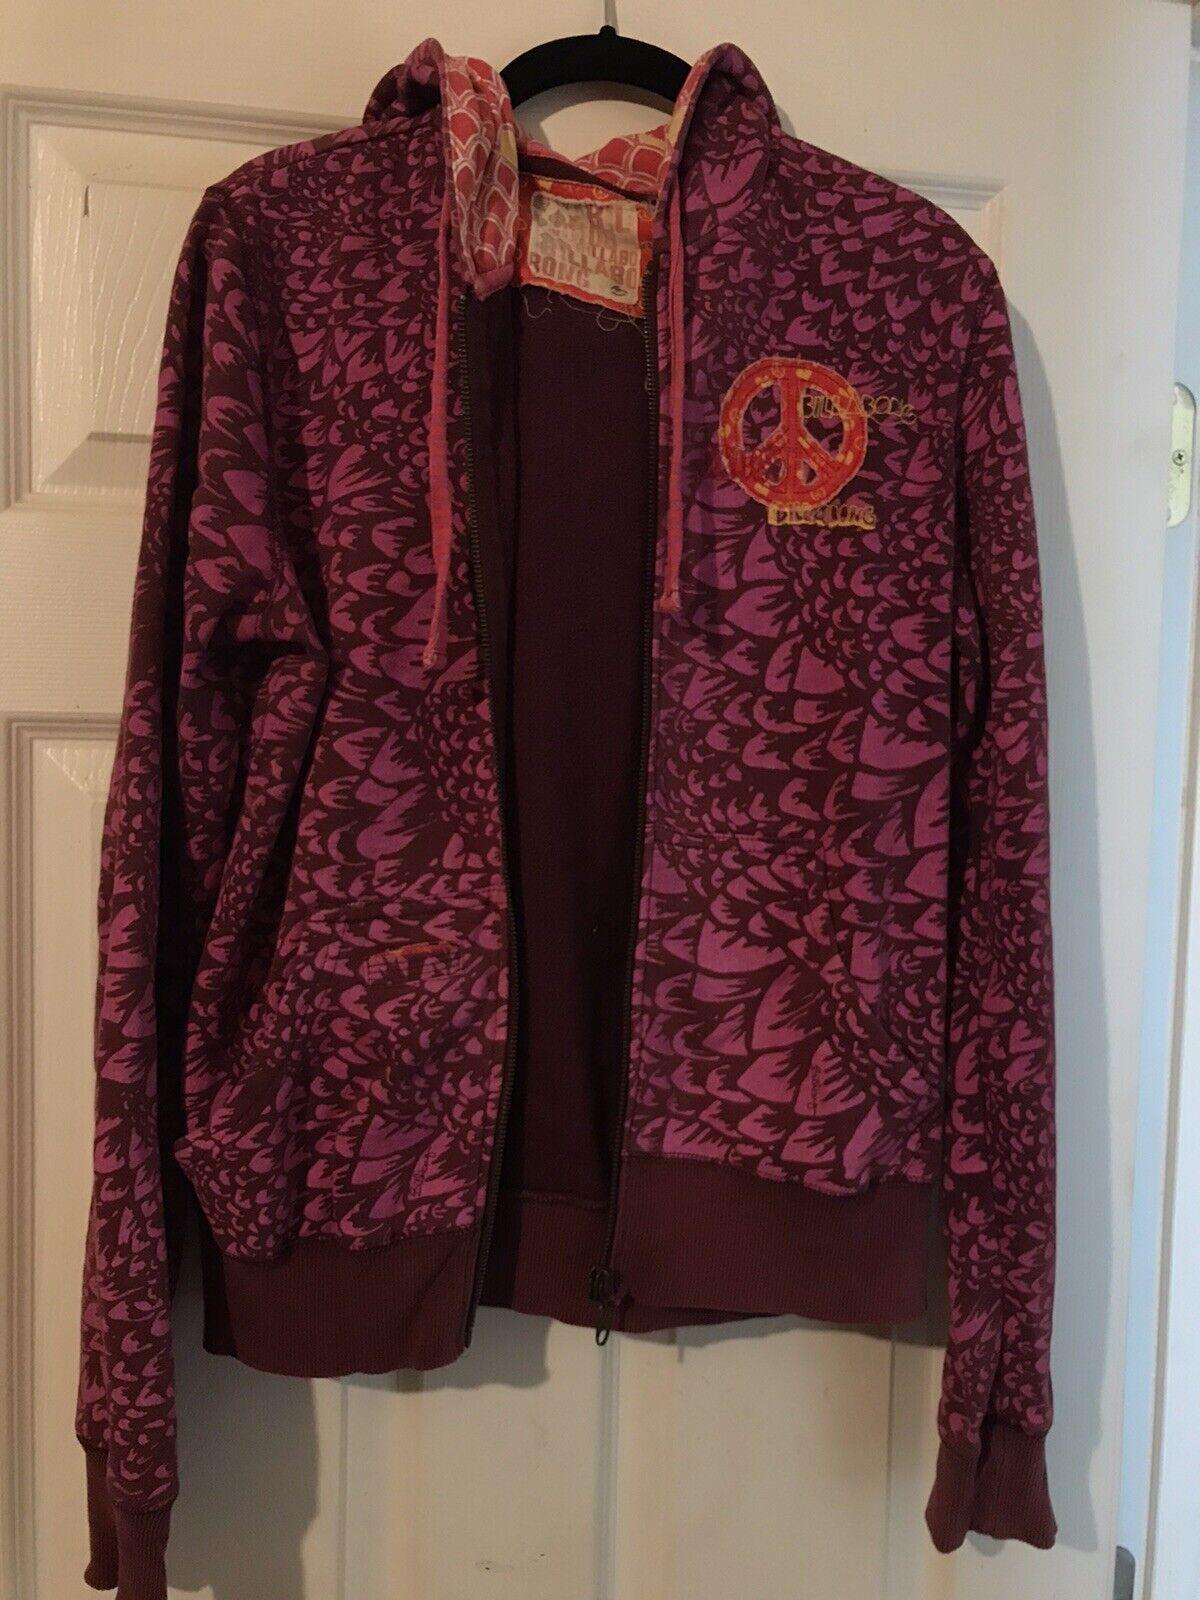 Billabong Hooded Jacket With 2 Outside Pockets- Women's Medium